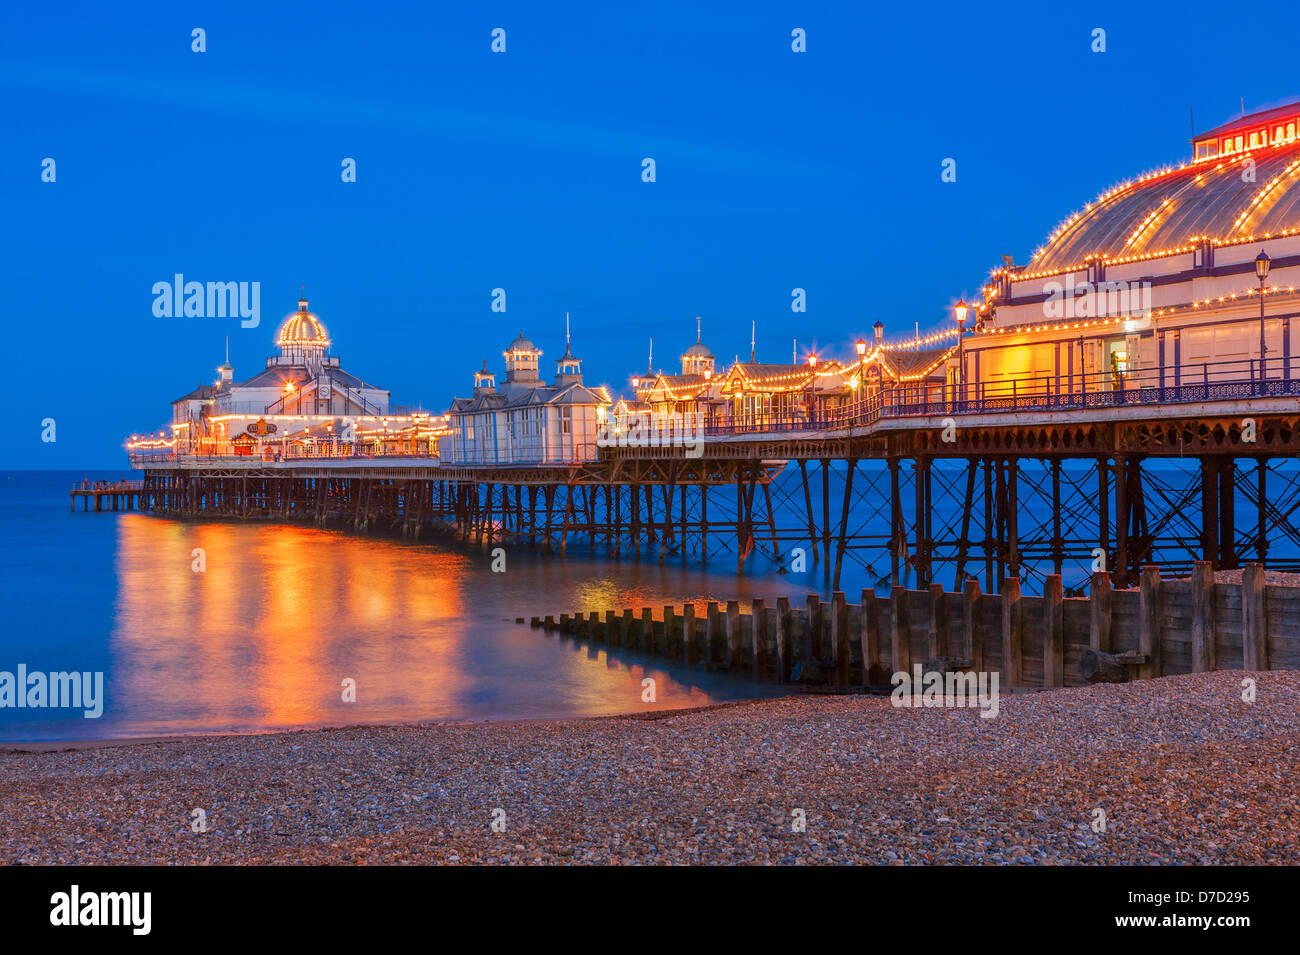 Eastbourne pier illuminated at Twilight - Stock Image